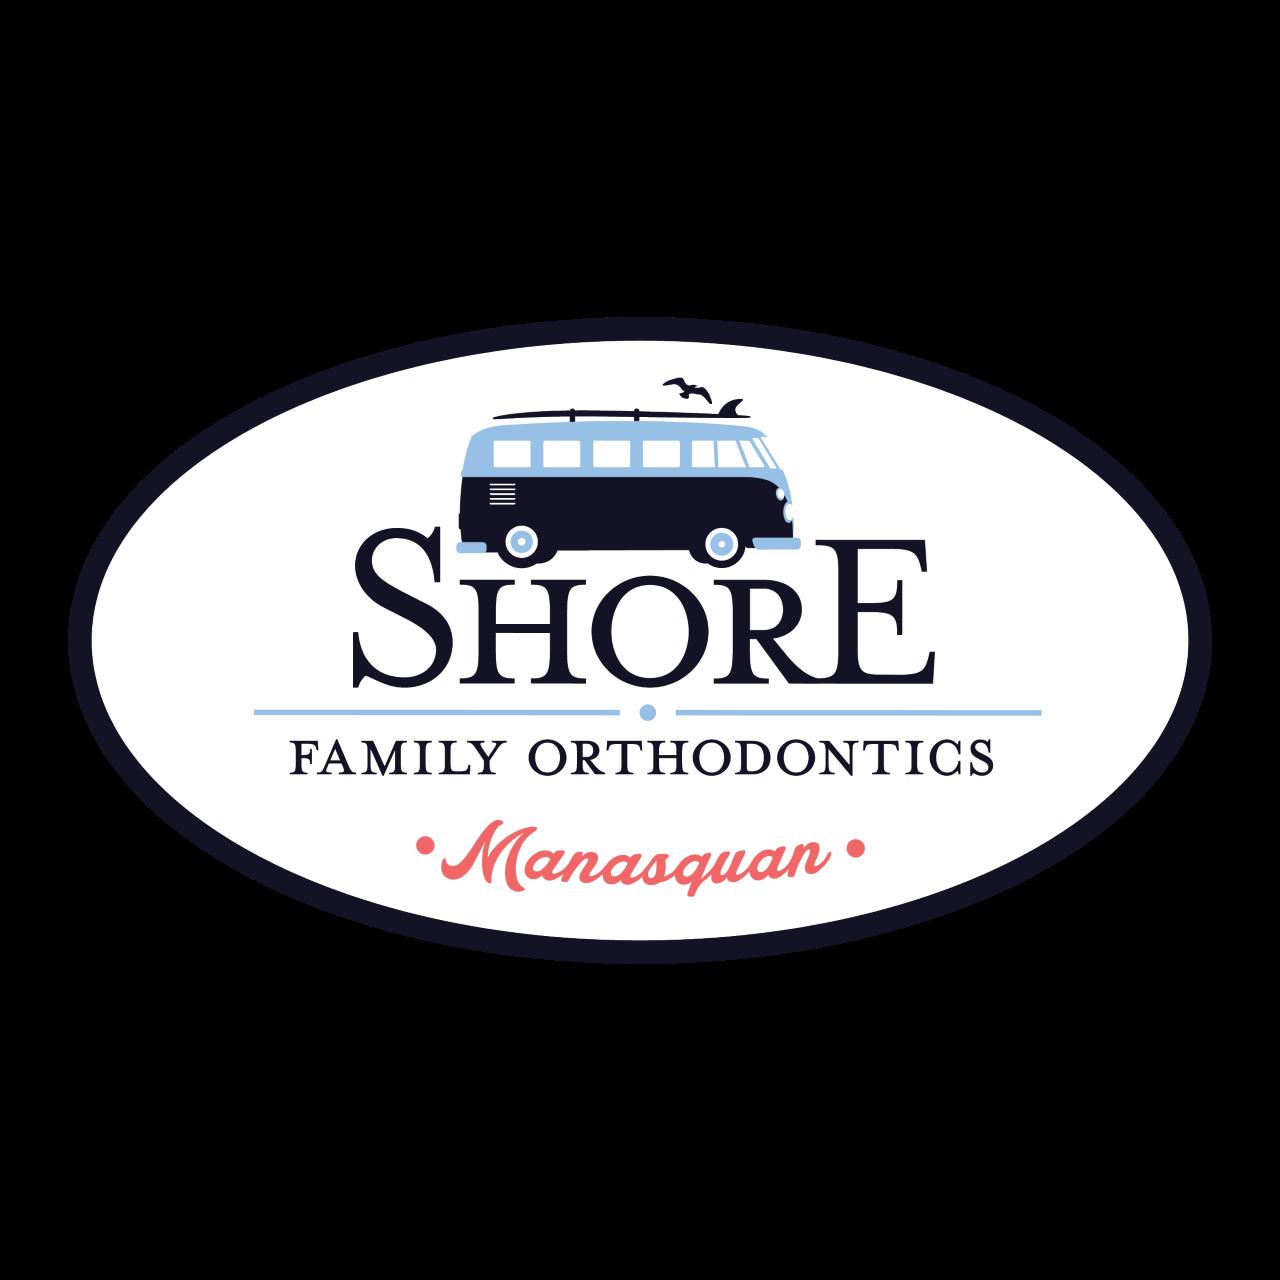 Shore Family Orthodontics